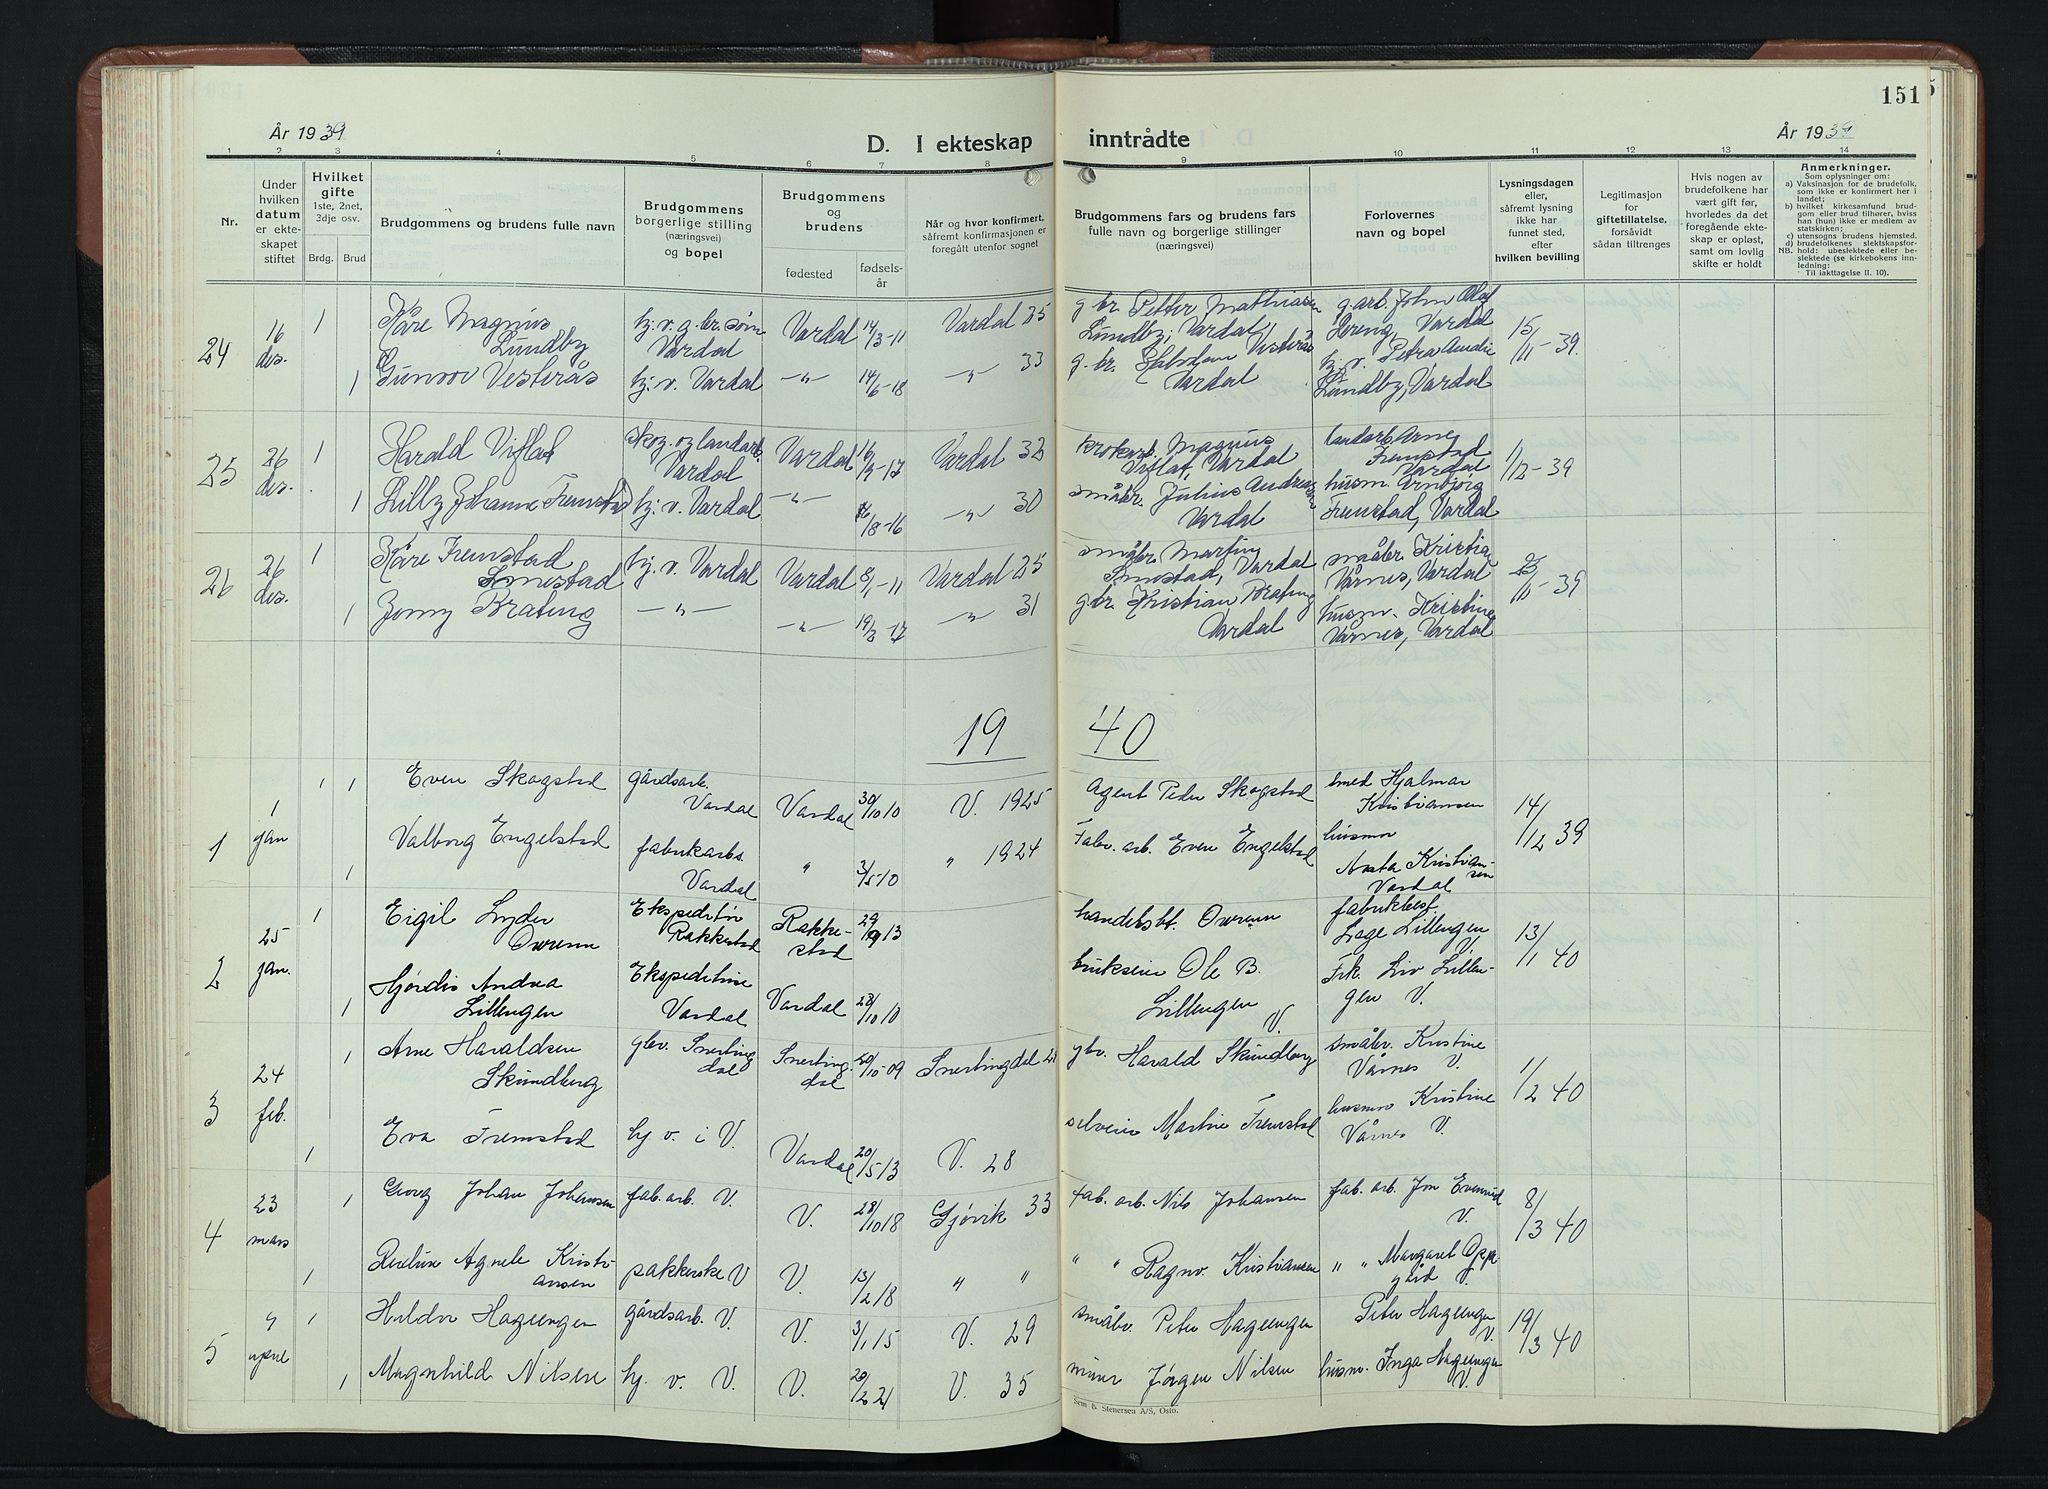 SAH, Vardal prestekontor, H/Ha/Hab/L0018: Klokkerbok nr. 18, 1931-1951, s. 151